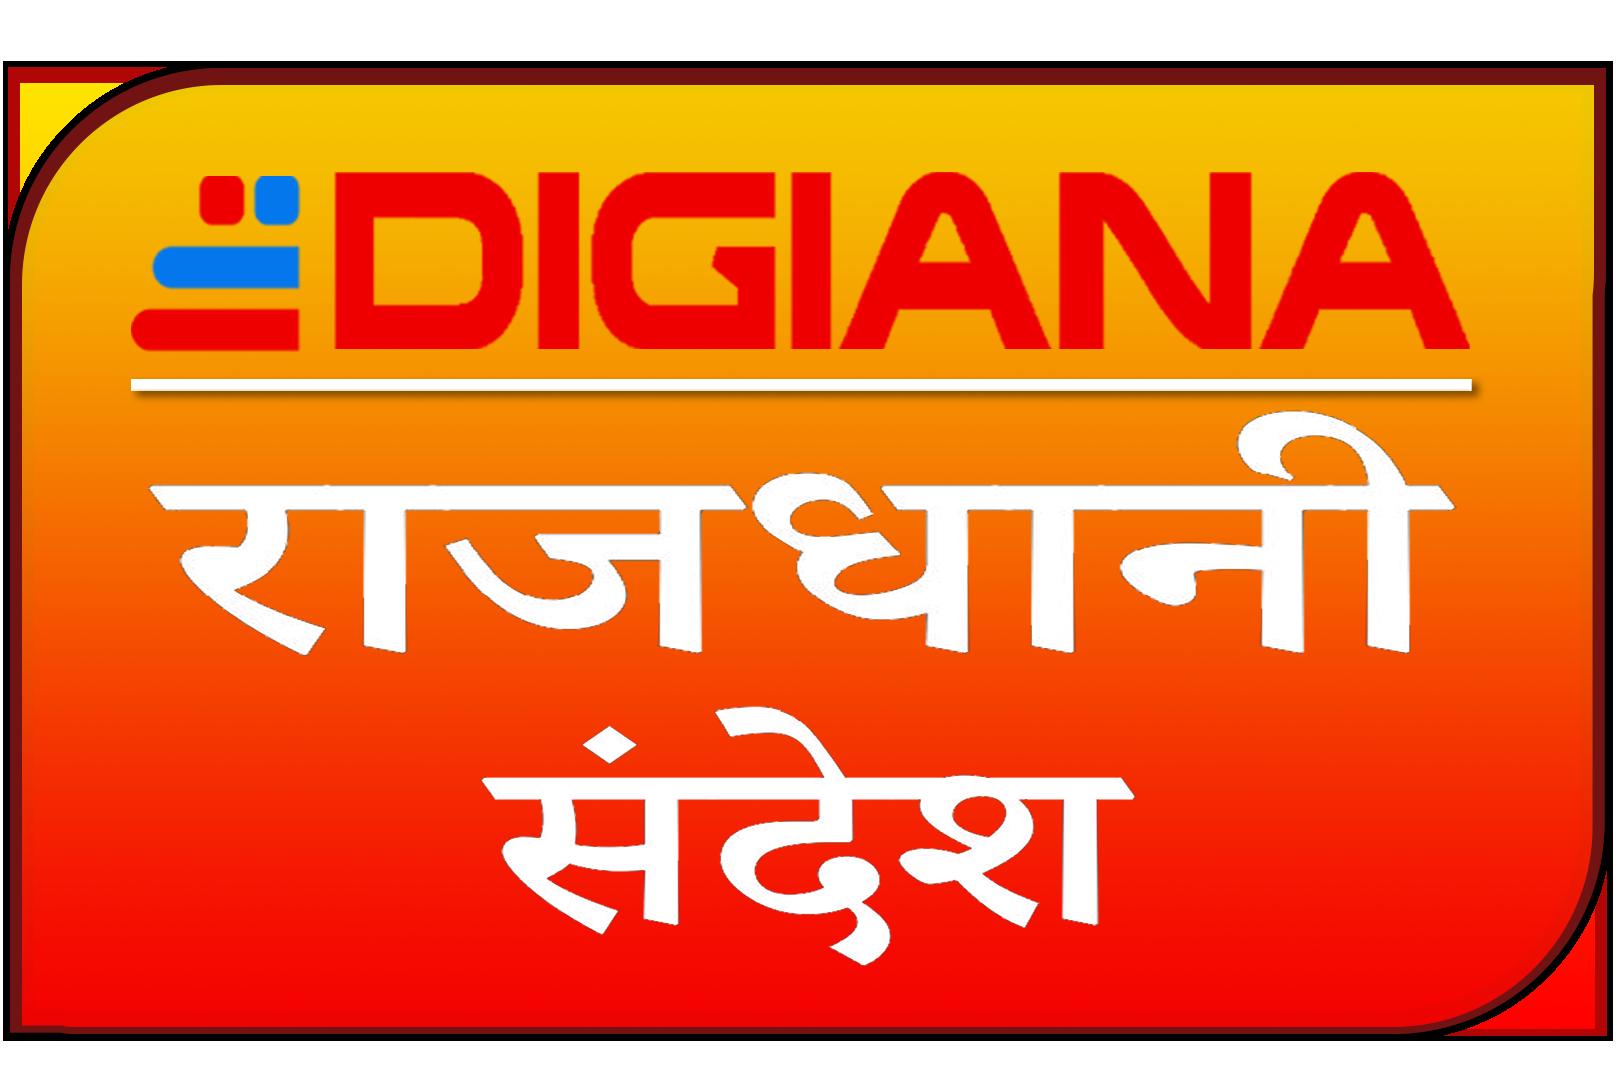 http://digiana.com/assets/uploads/live_tv/20211023175450.png